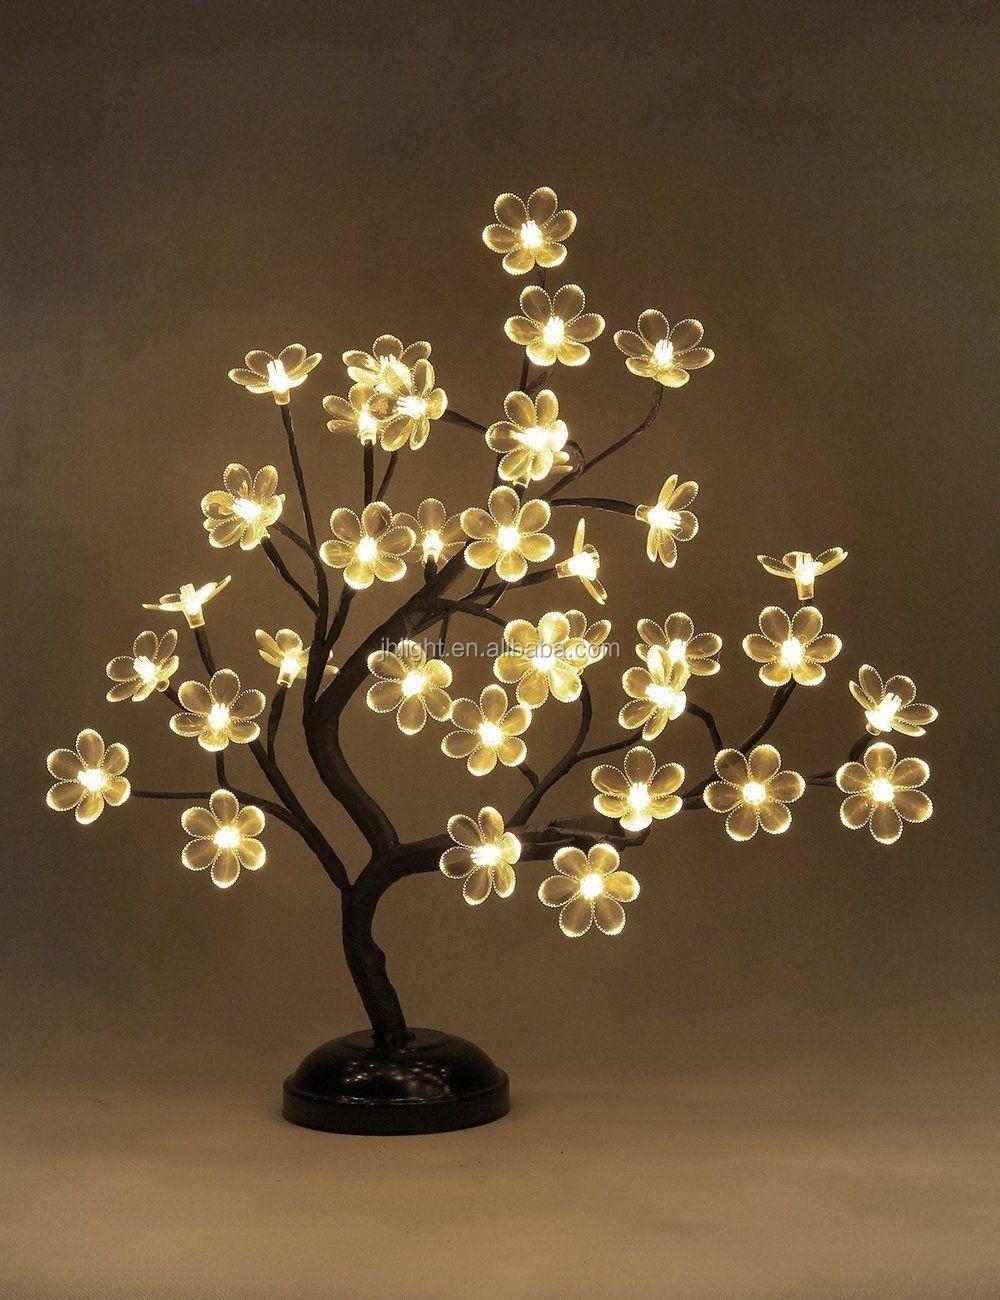 110 220v new led crystal cherry blossom tree lamp night - Mesa tower crystal ...